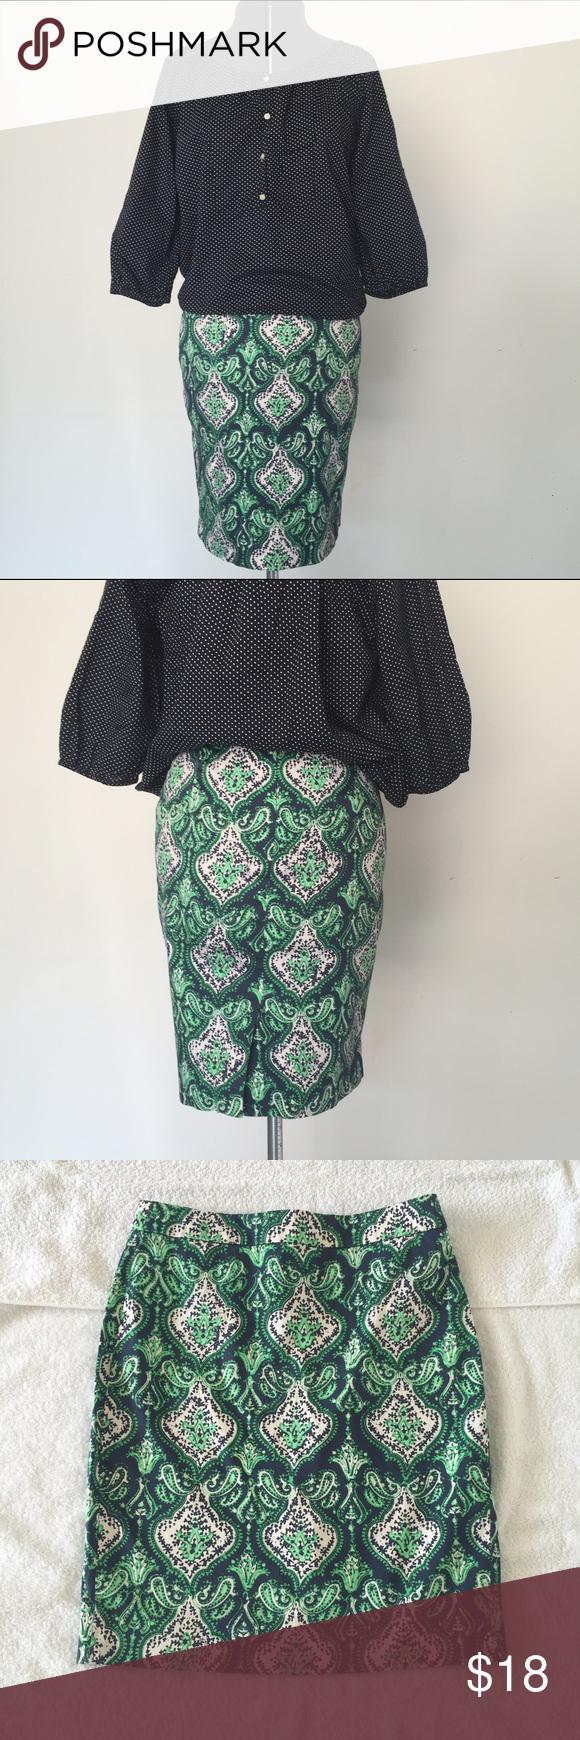 "J Crew Factory ""the Pencil Skirt"" in bold print J Crew Factory ""the Pencil Skirt"" in bold print. Size 2 measures flat: 14.5"" across waist, 17.5"" across hips, 20.5"" long, 6"" slit. 98% cotton, 2% stretch. Back zip close. 727/100/072916 J. Crew Skirts Pencil"